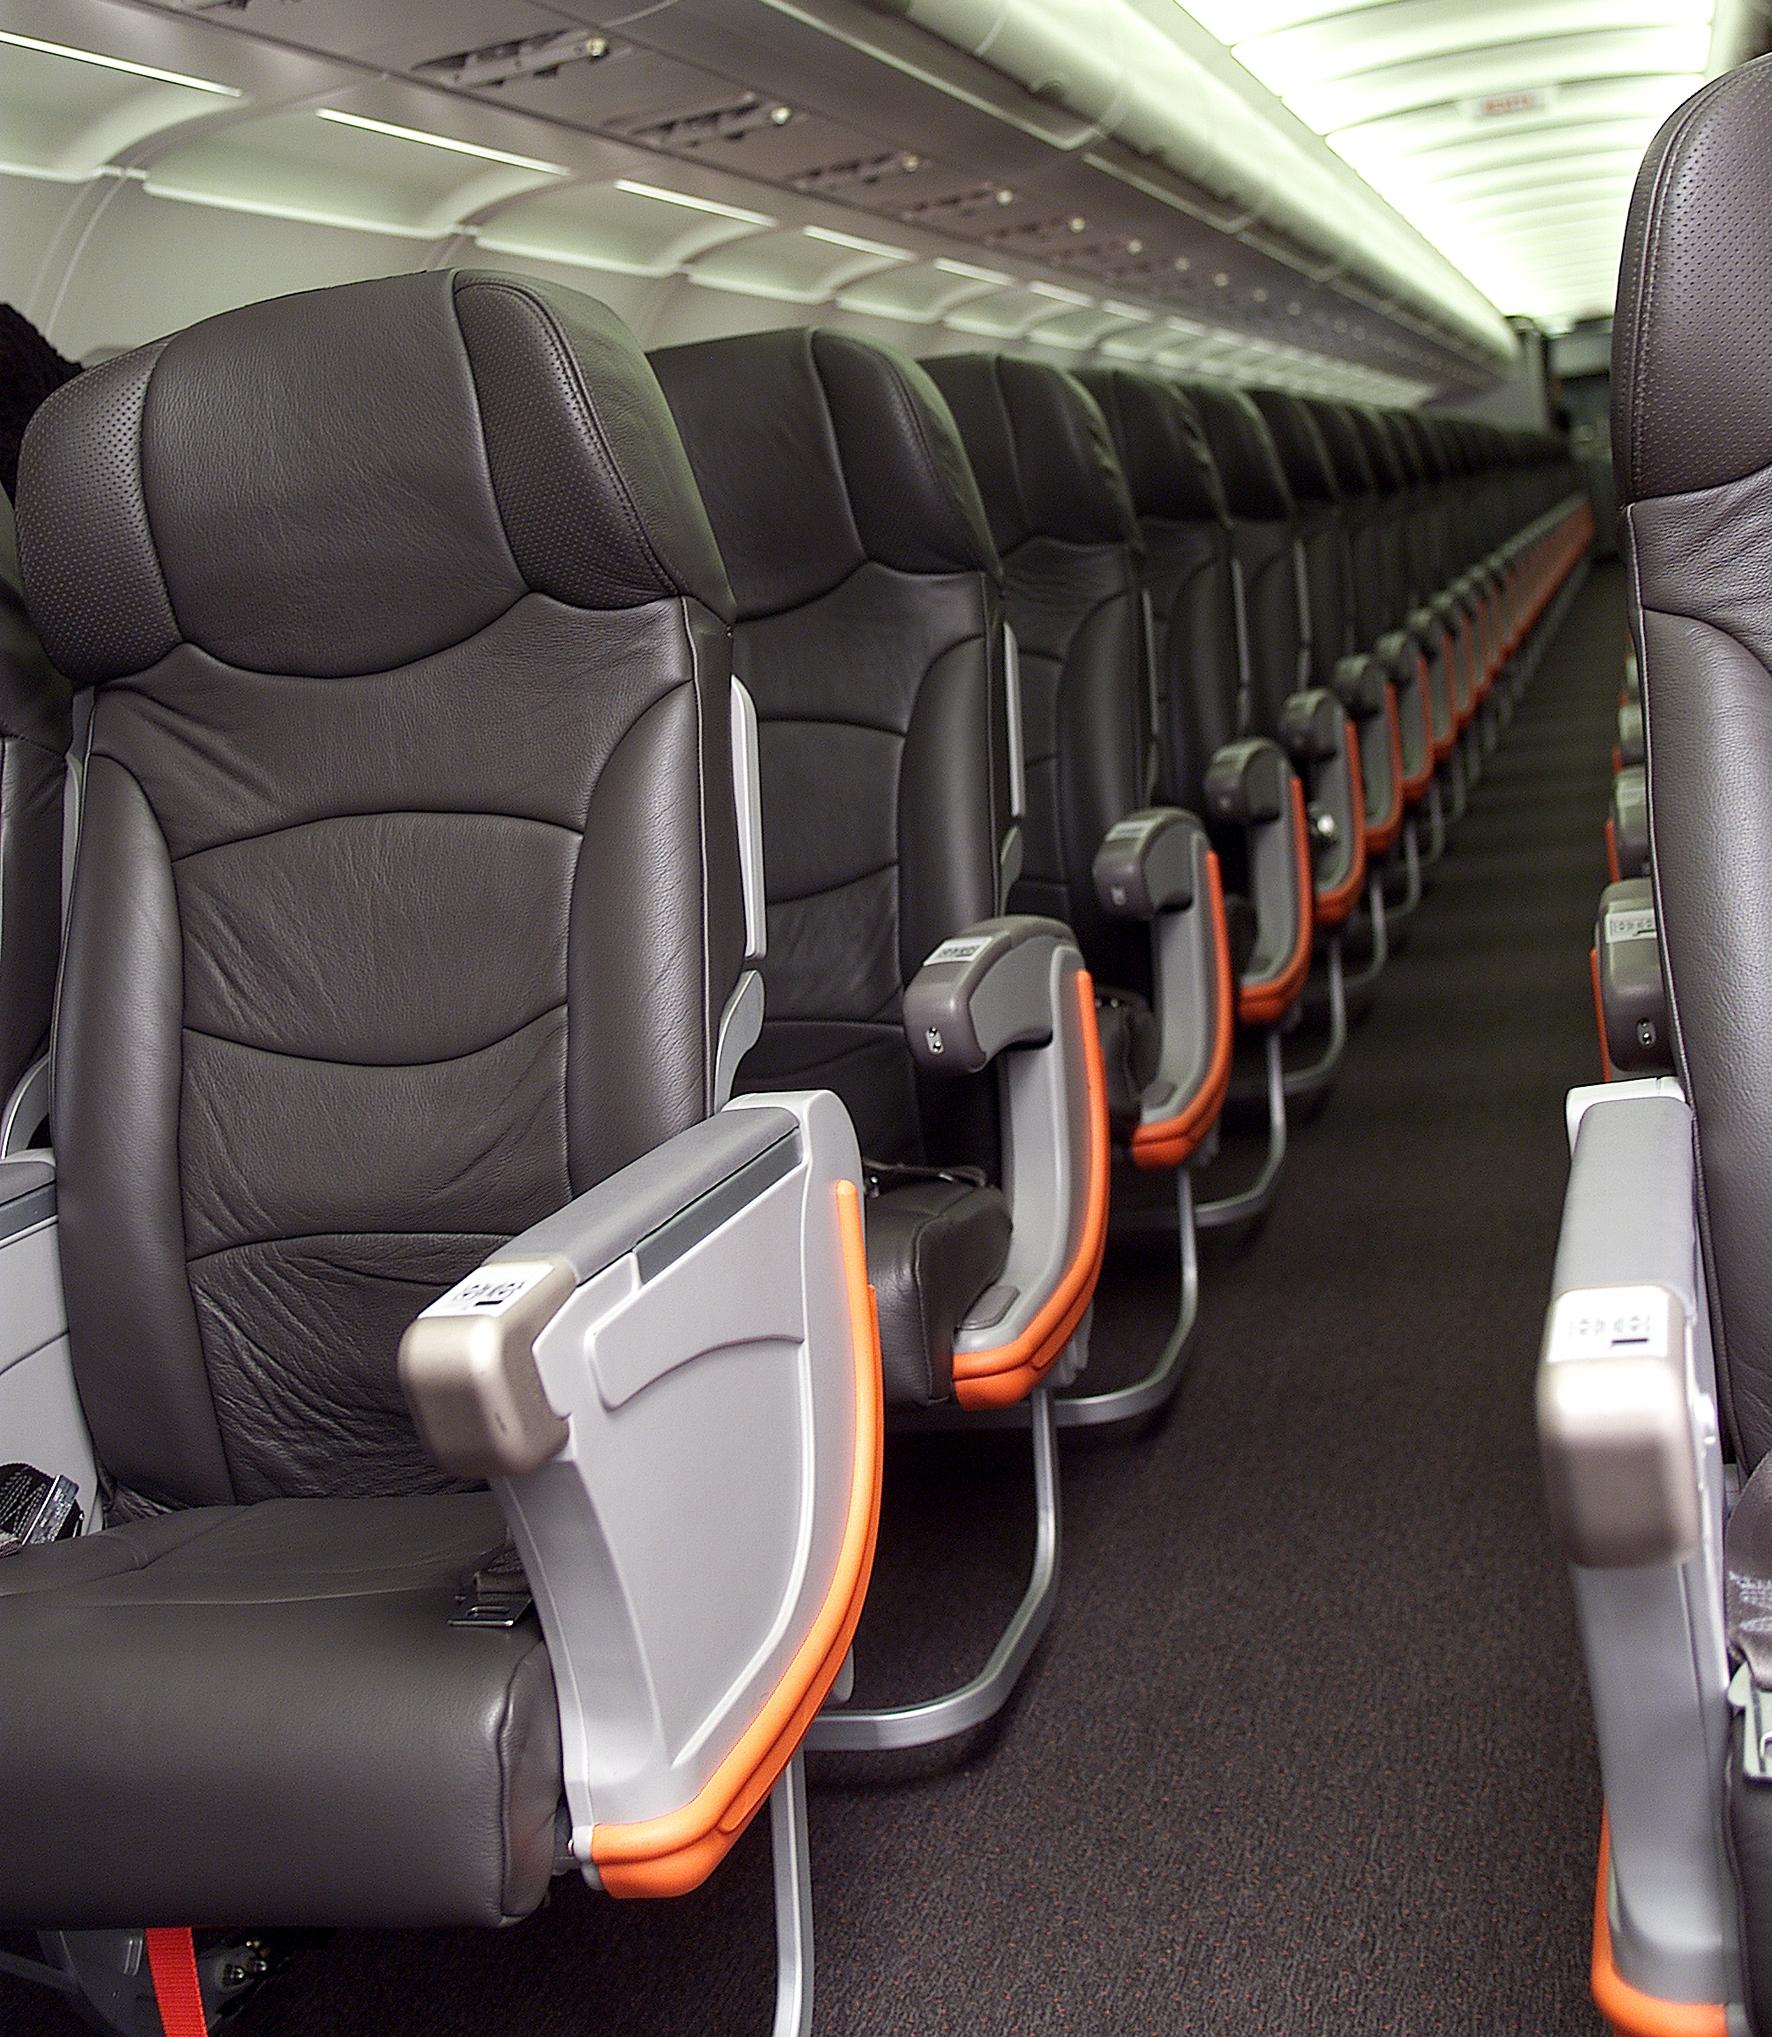 File:Jetstar Airbus A320 cabin interior (6768081223).jpg - Wikimedia ...